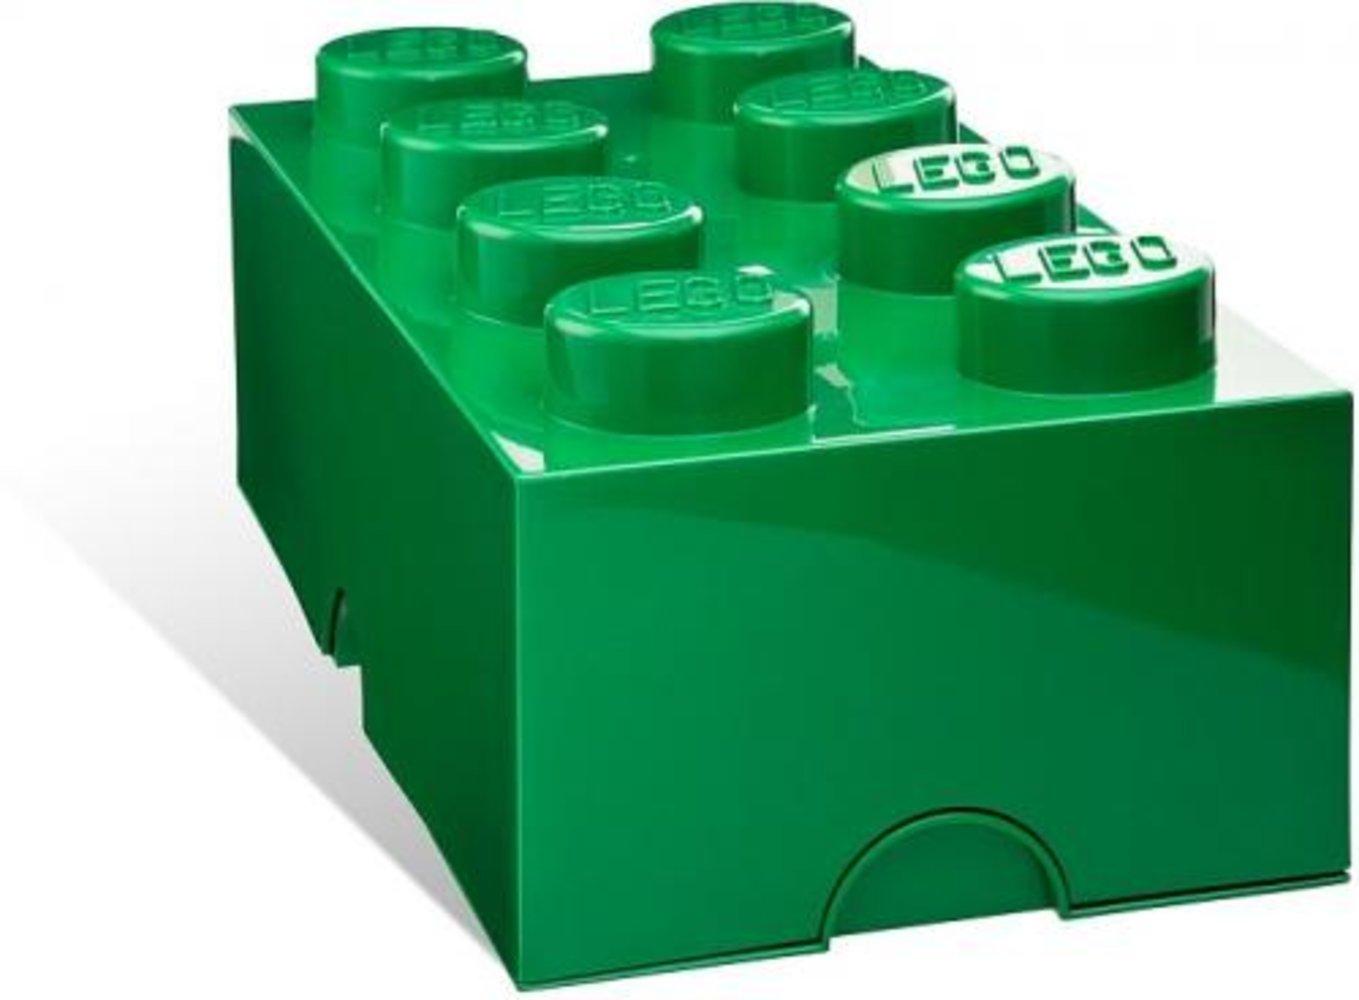 8-stud Green Storage Brick